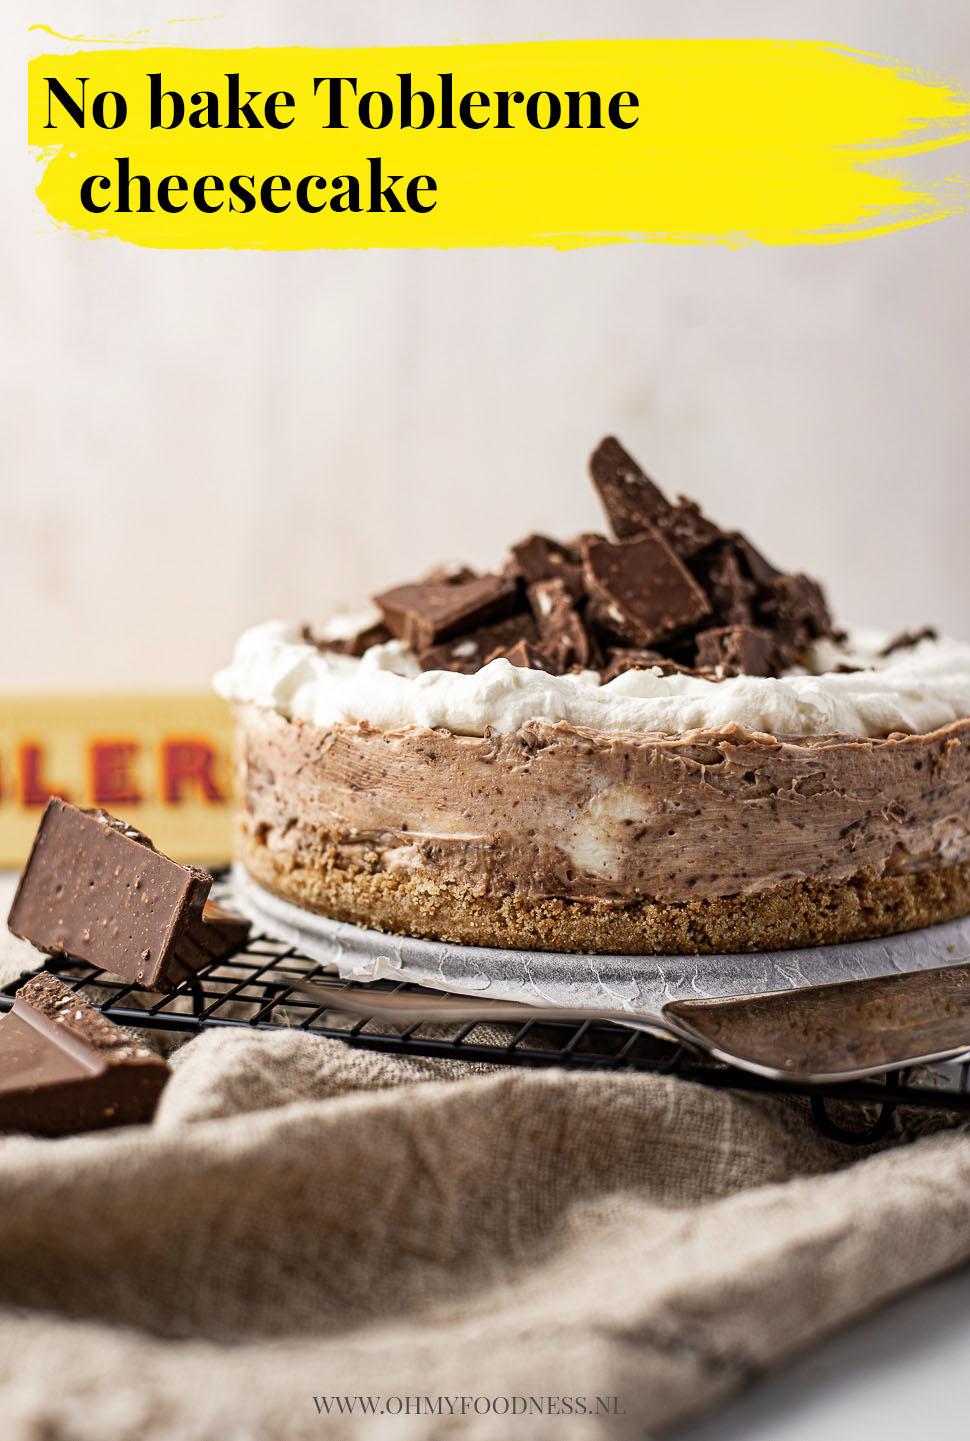 No bake toblerone cheesecake